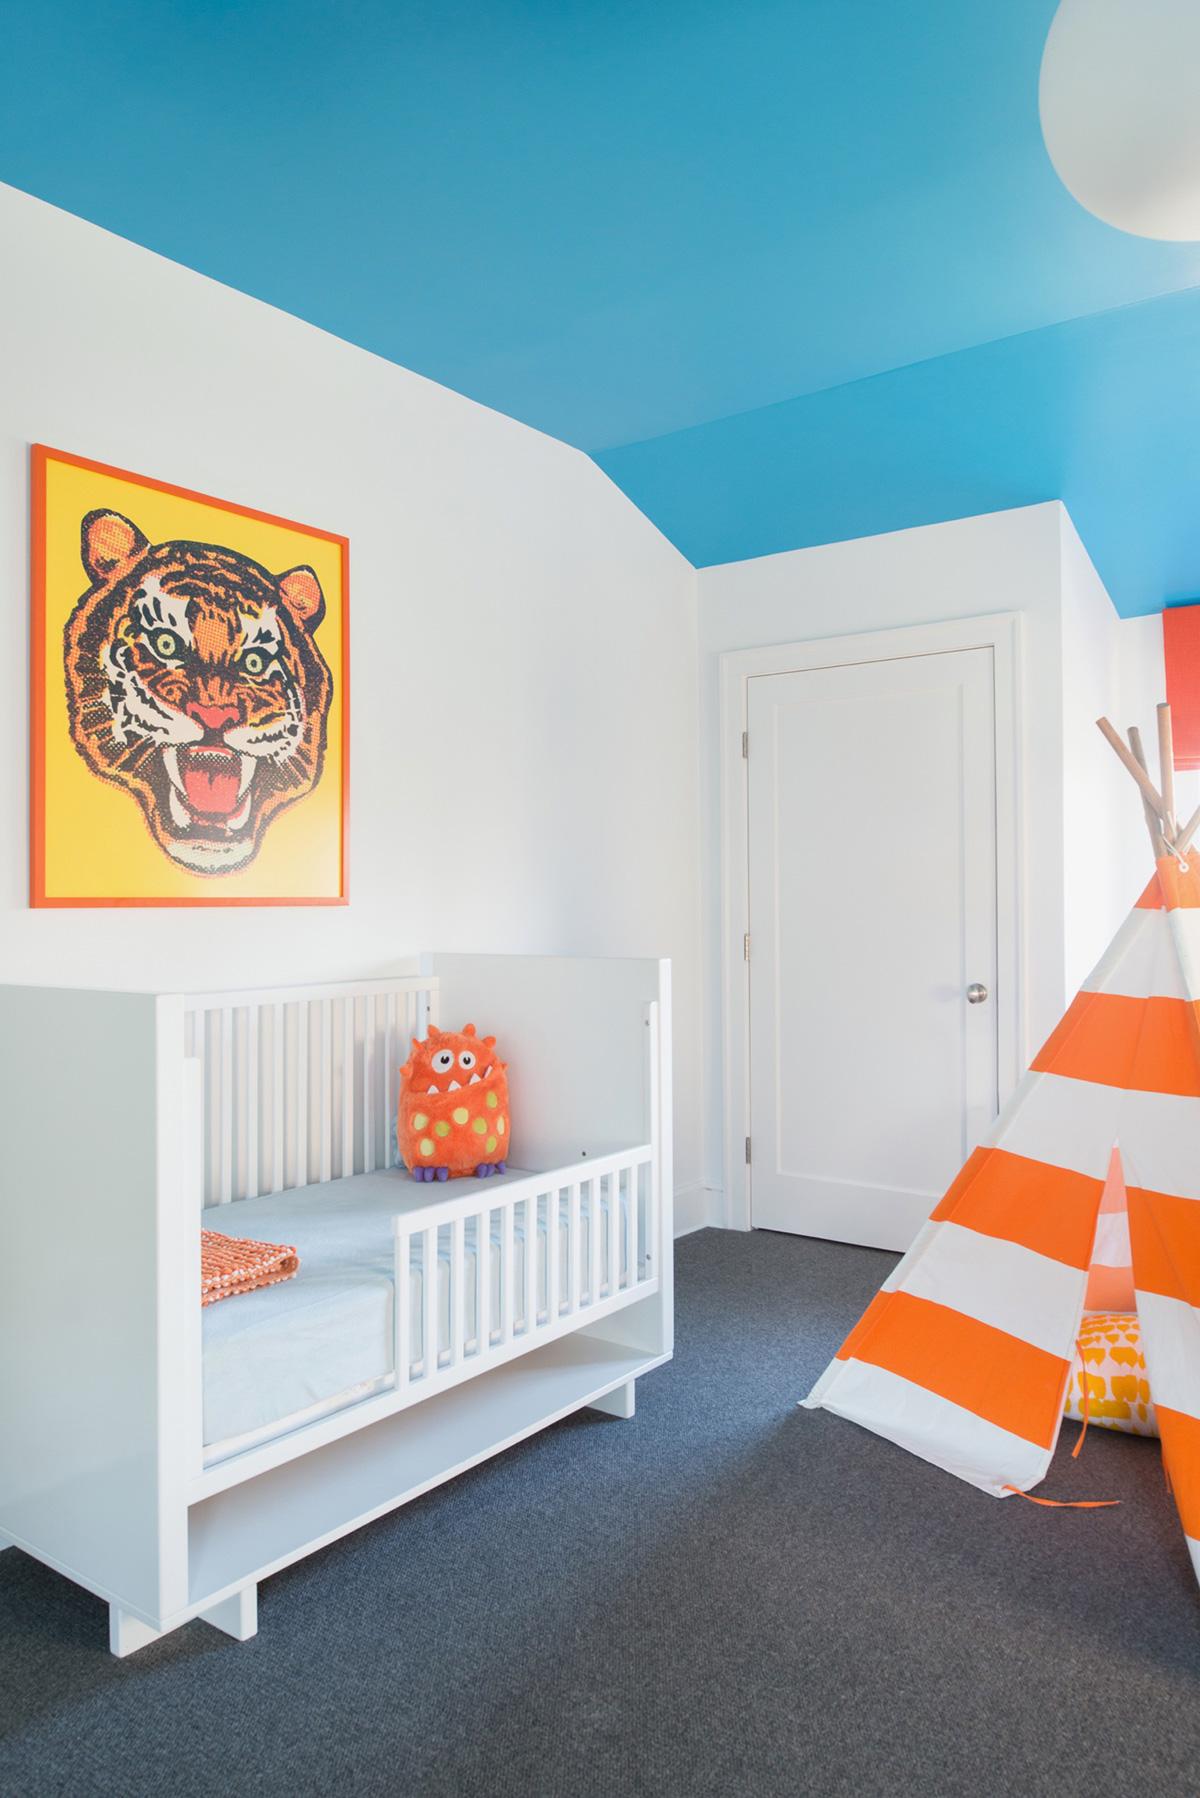 interiors-kids-are-people-new-1.jpg